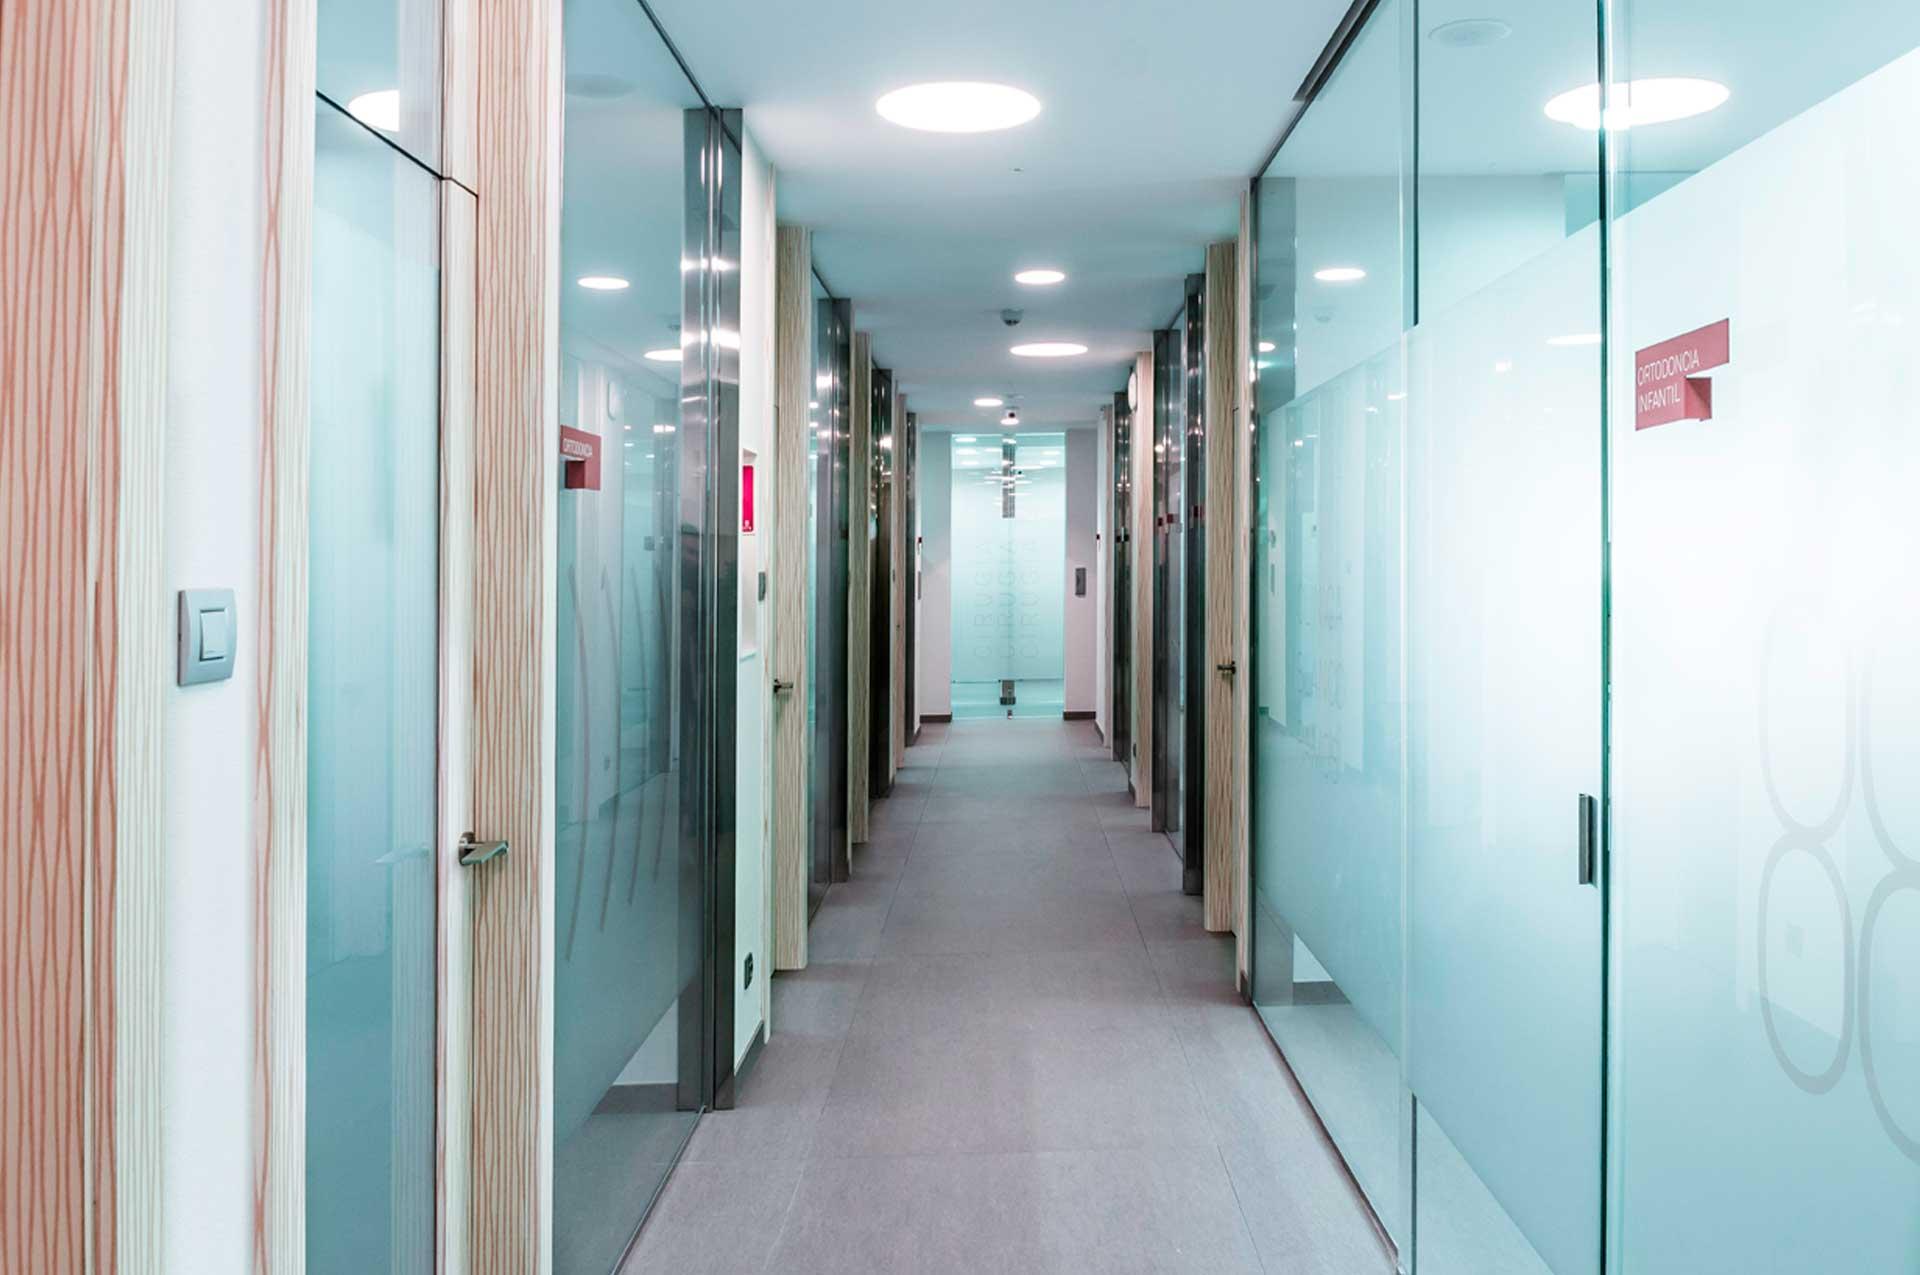 acceso gabinetes clinica blanco ramos